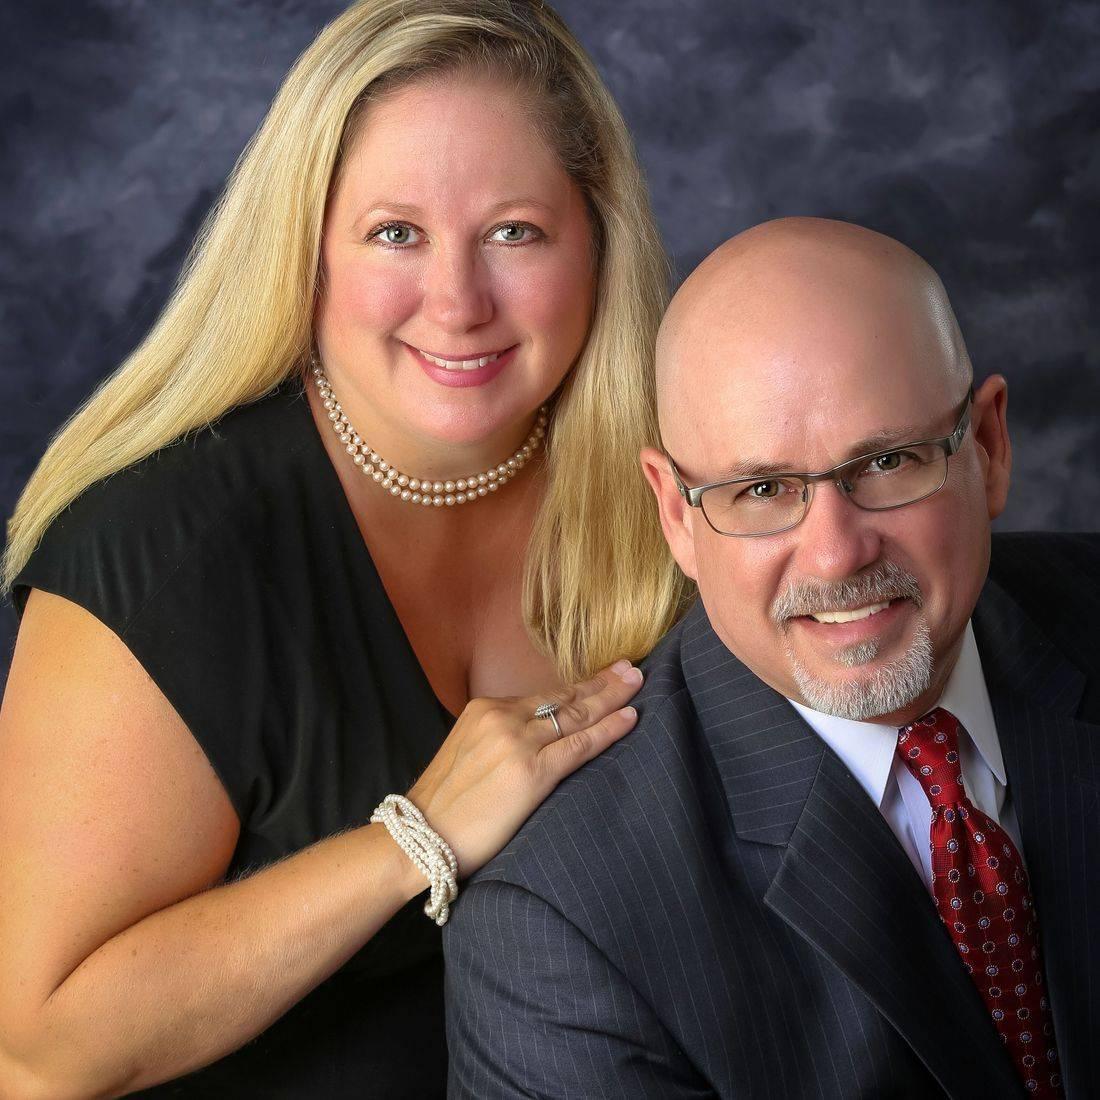 Criminal Defense Personal Injury Business Litigation Attorney